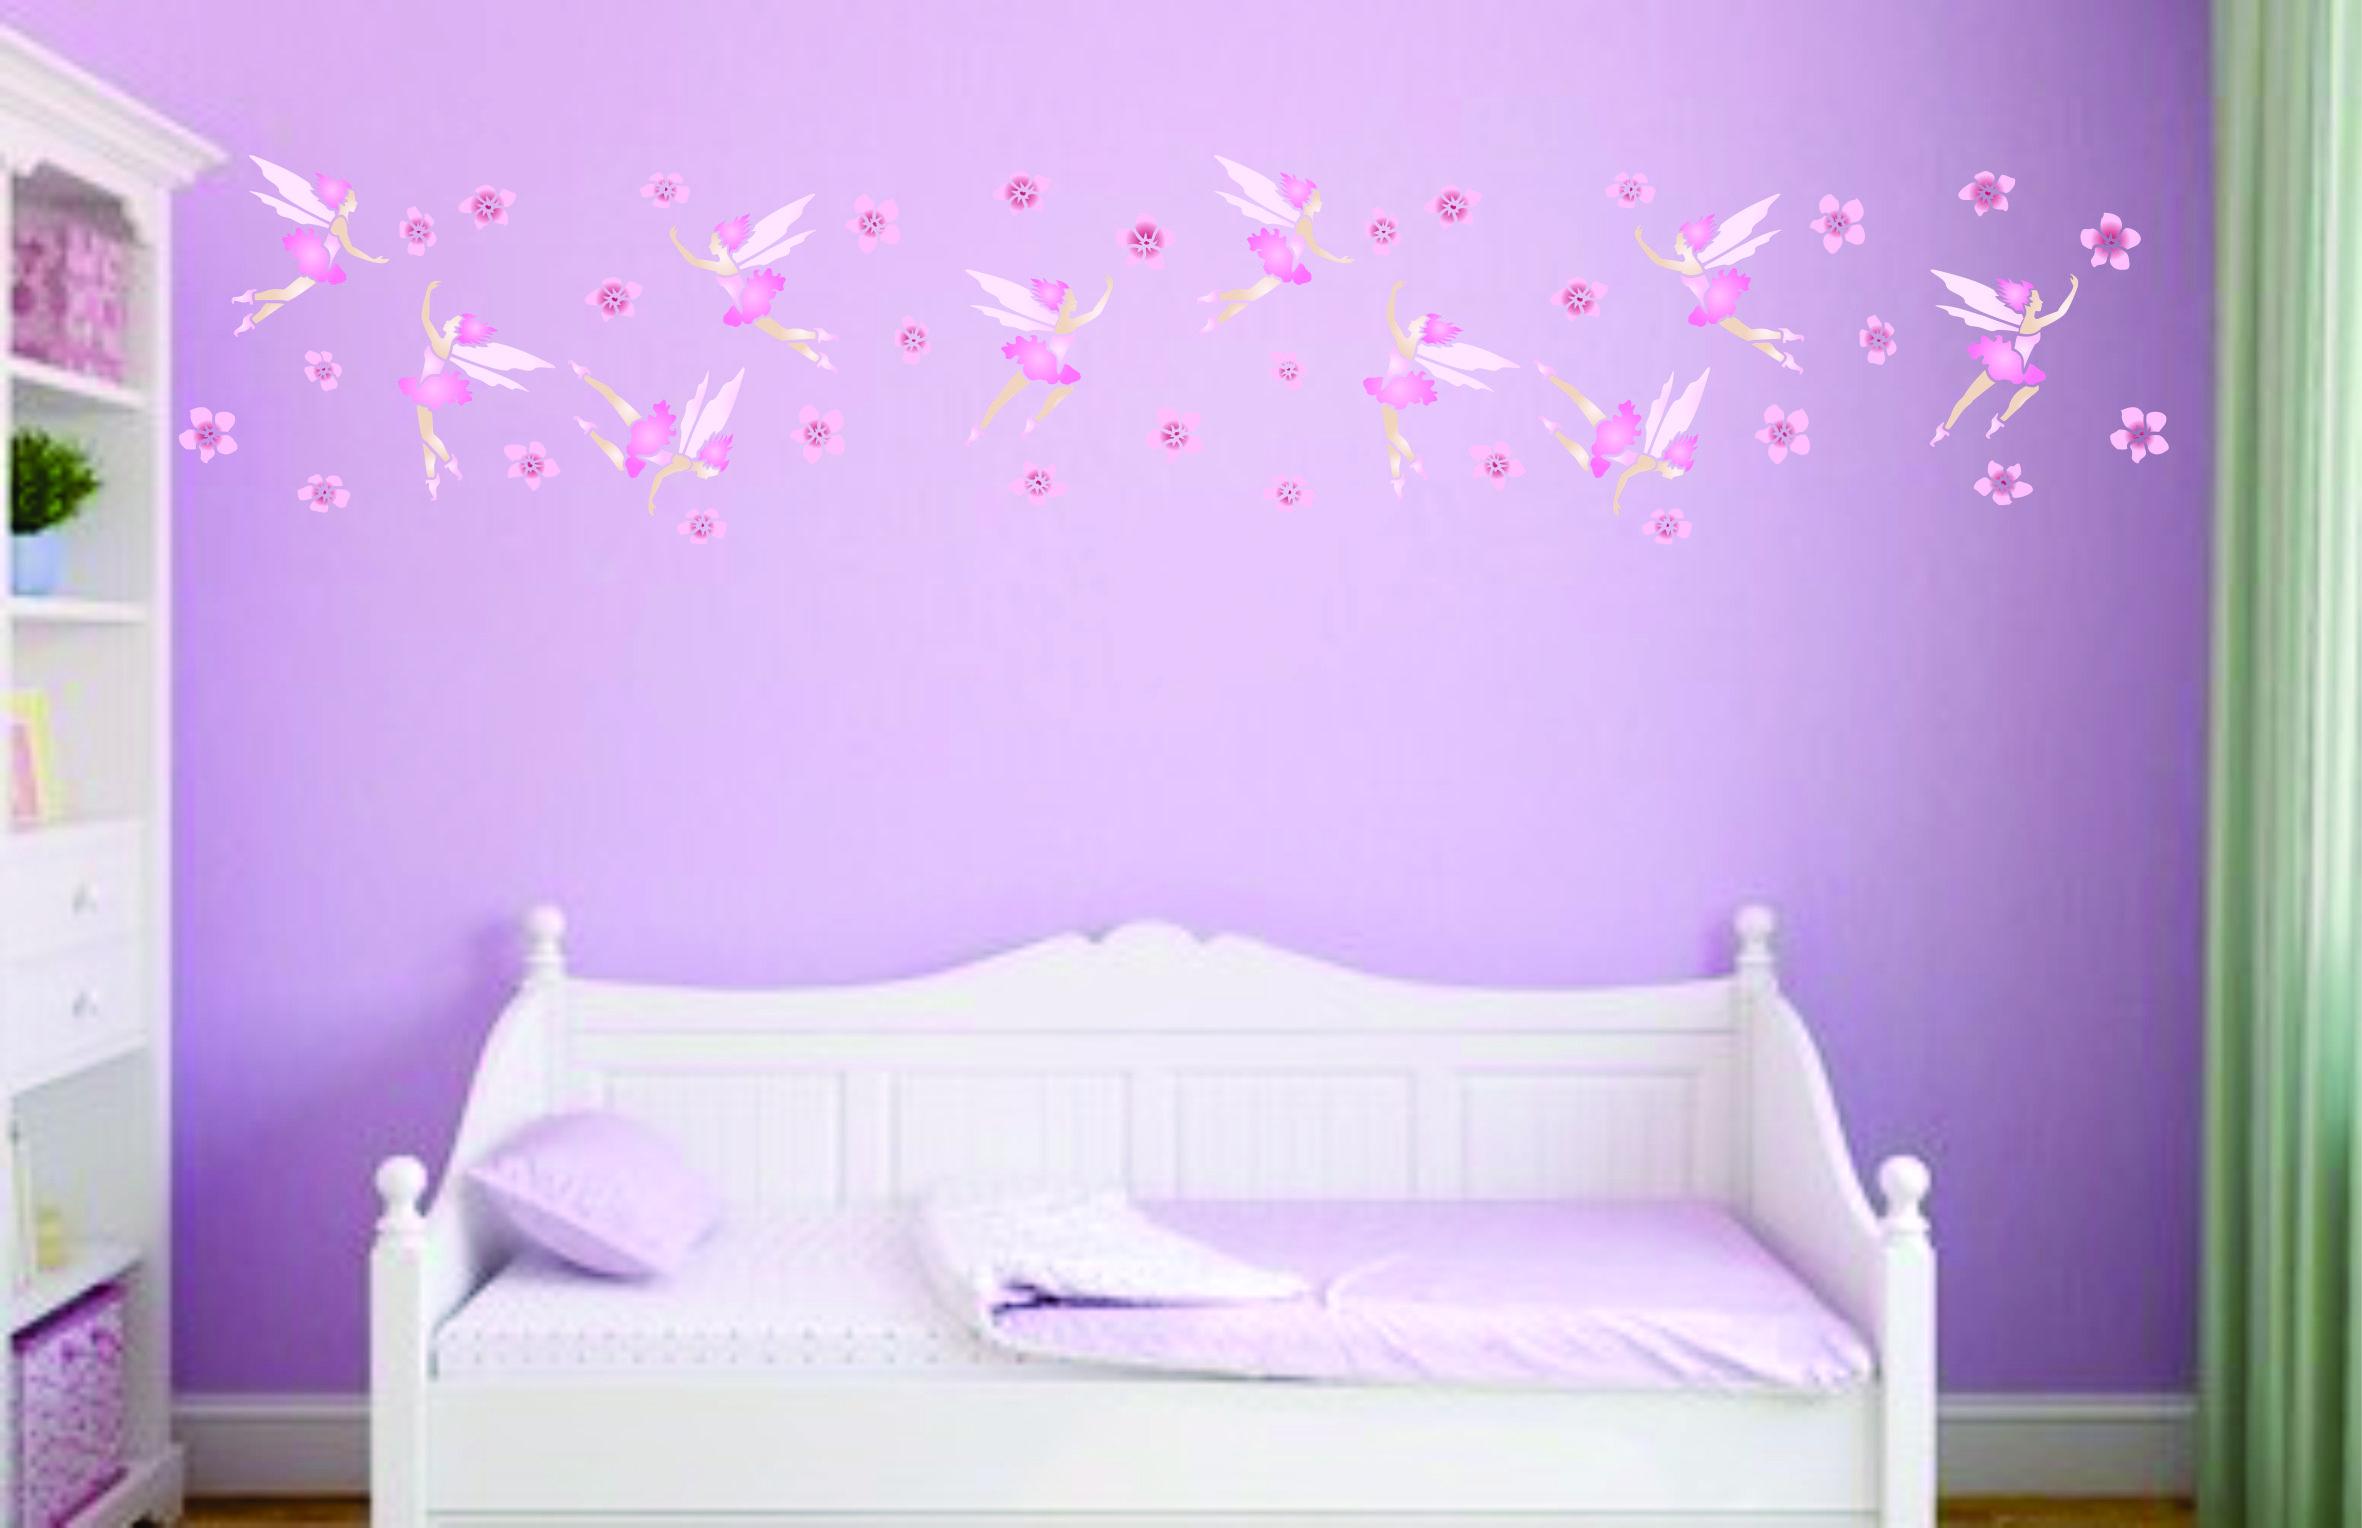 Beautiful Spring Fairies Stencil For Easy Diy Walls In A Girls